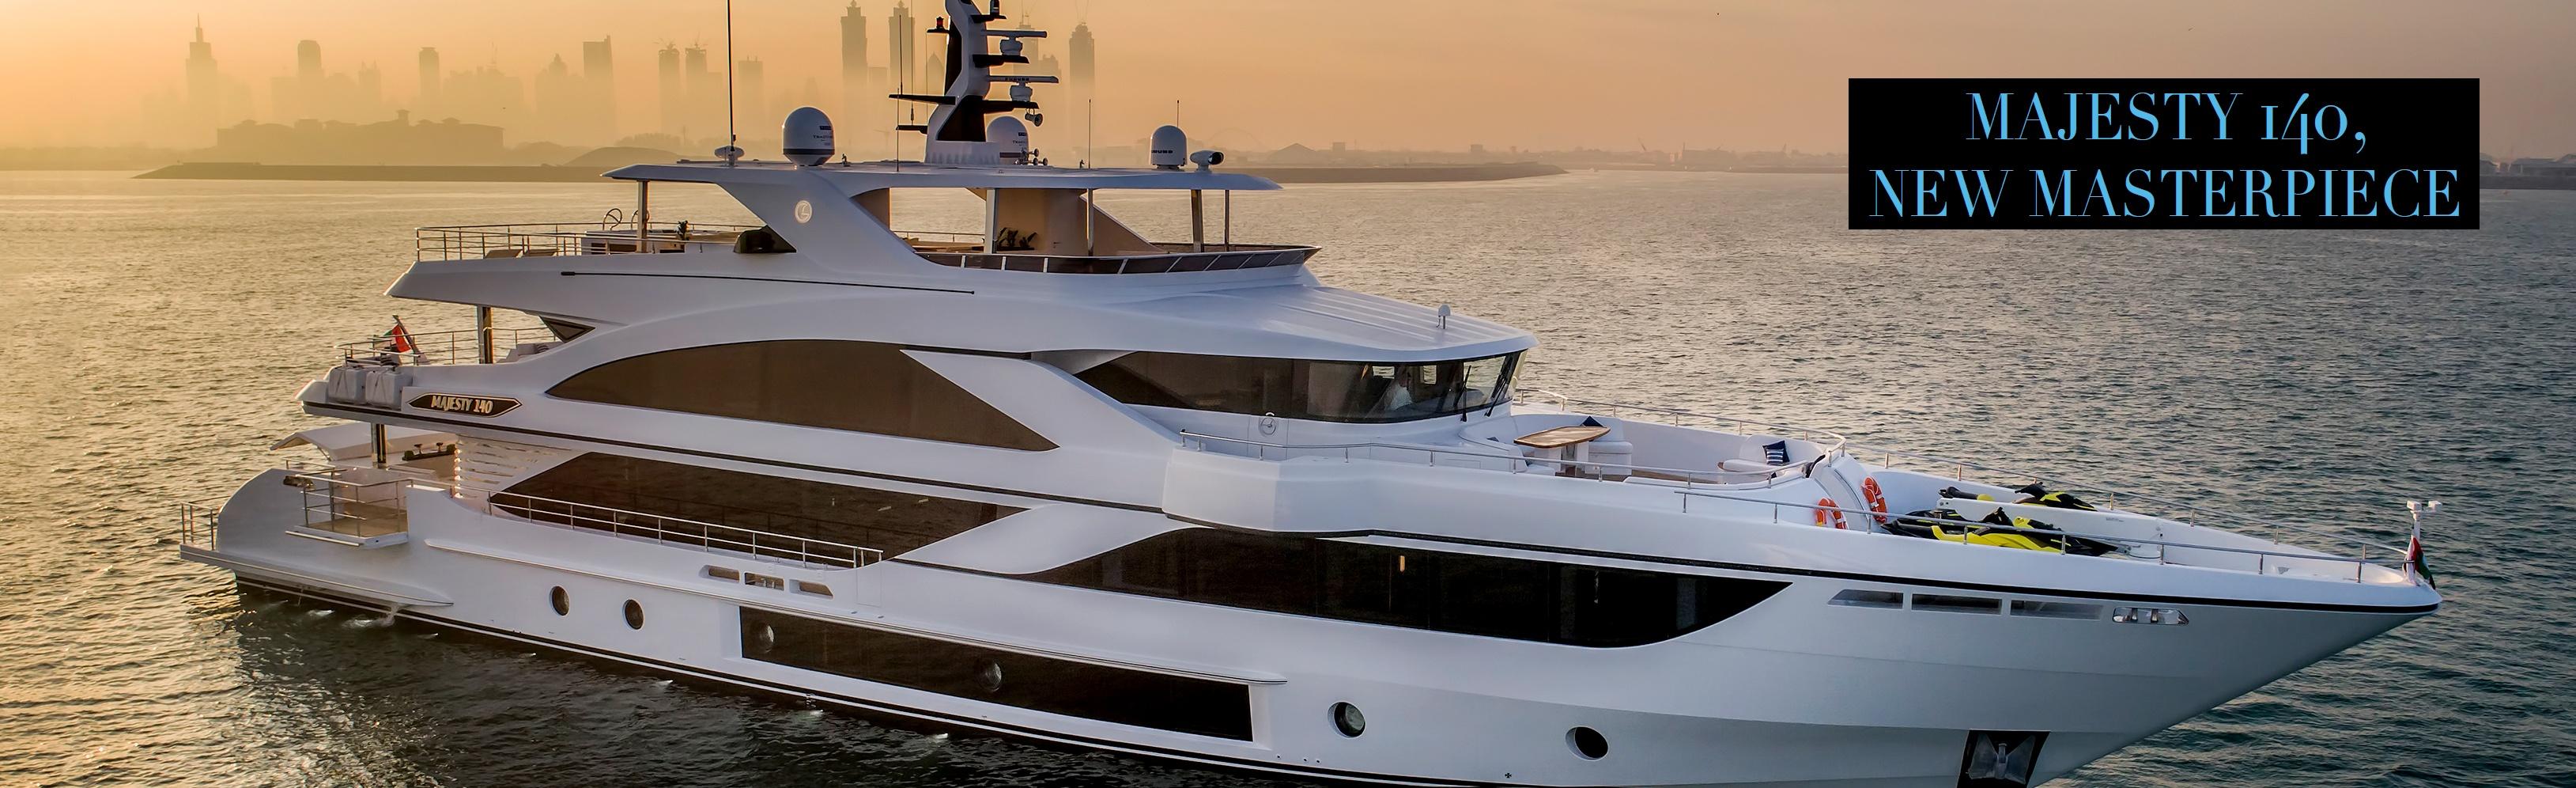 Majesty-140,-Superyacht-One